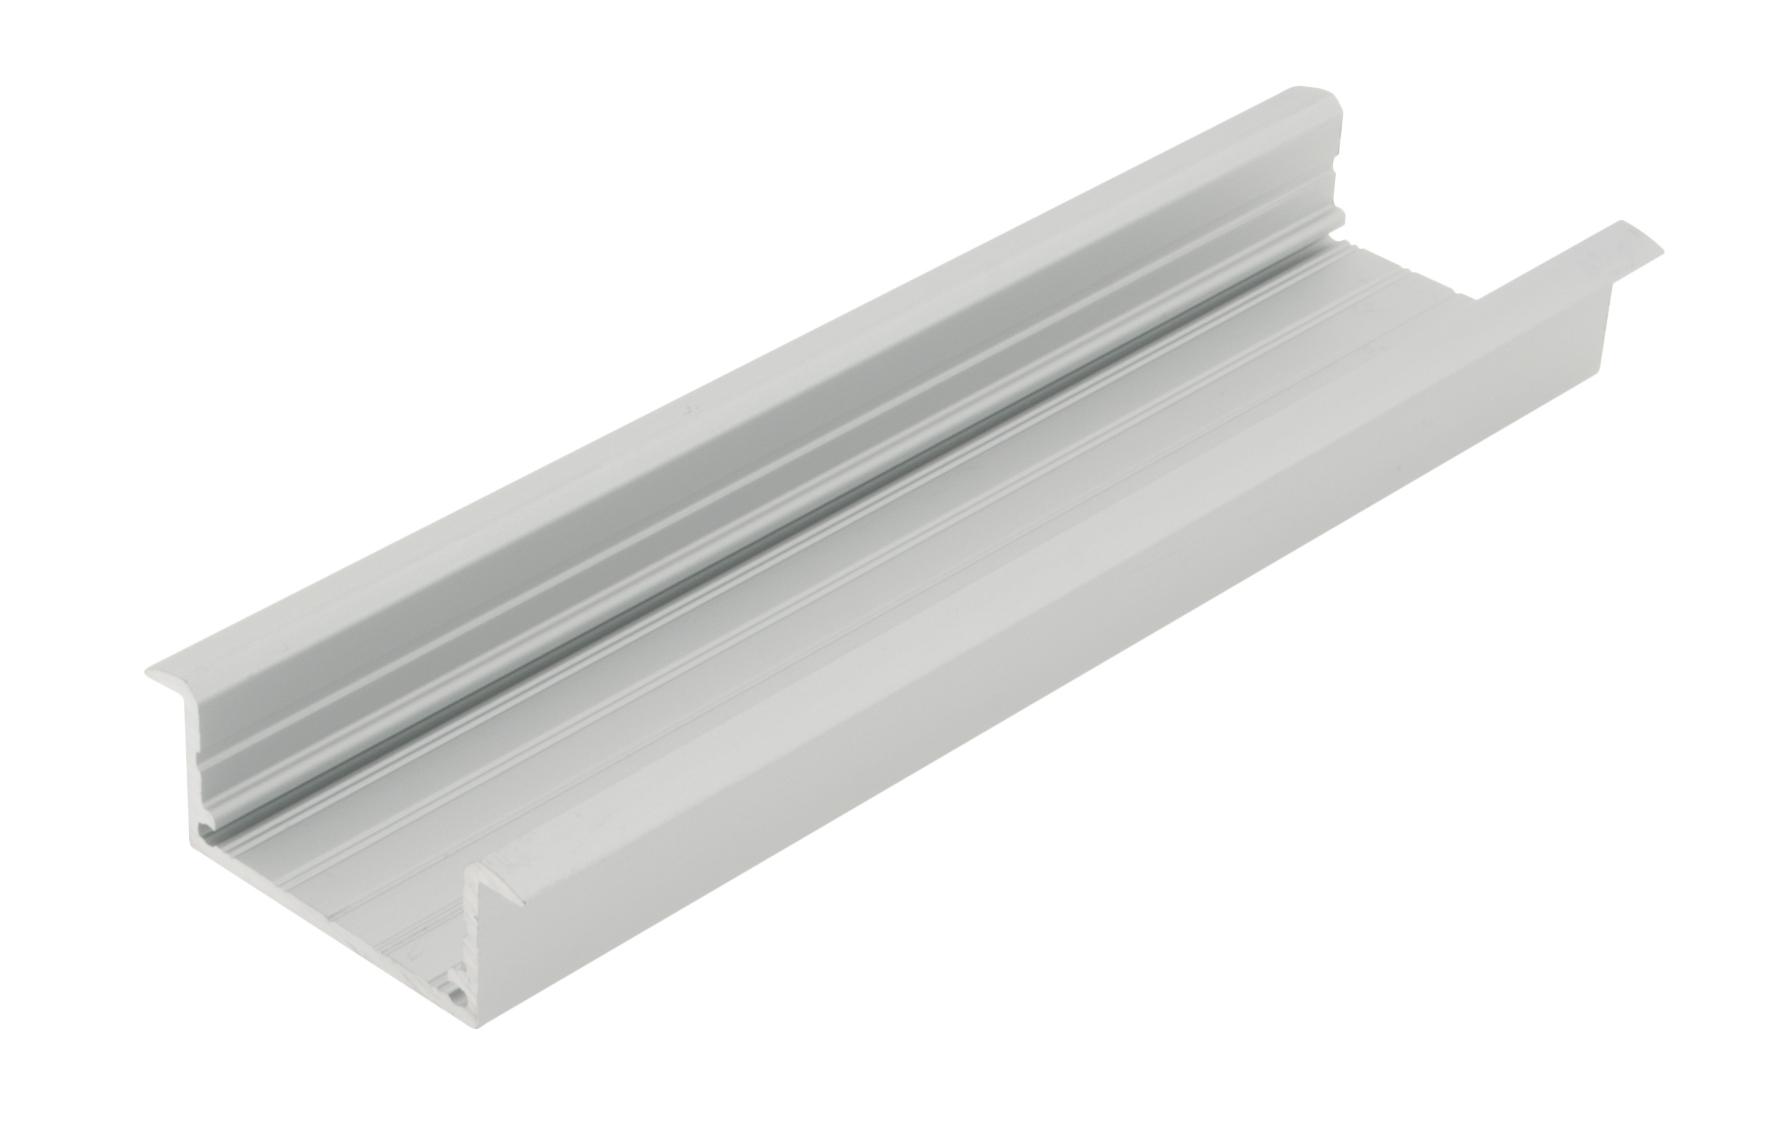 1 m Aluminium Profil CLU LIAP006004